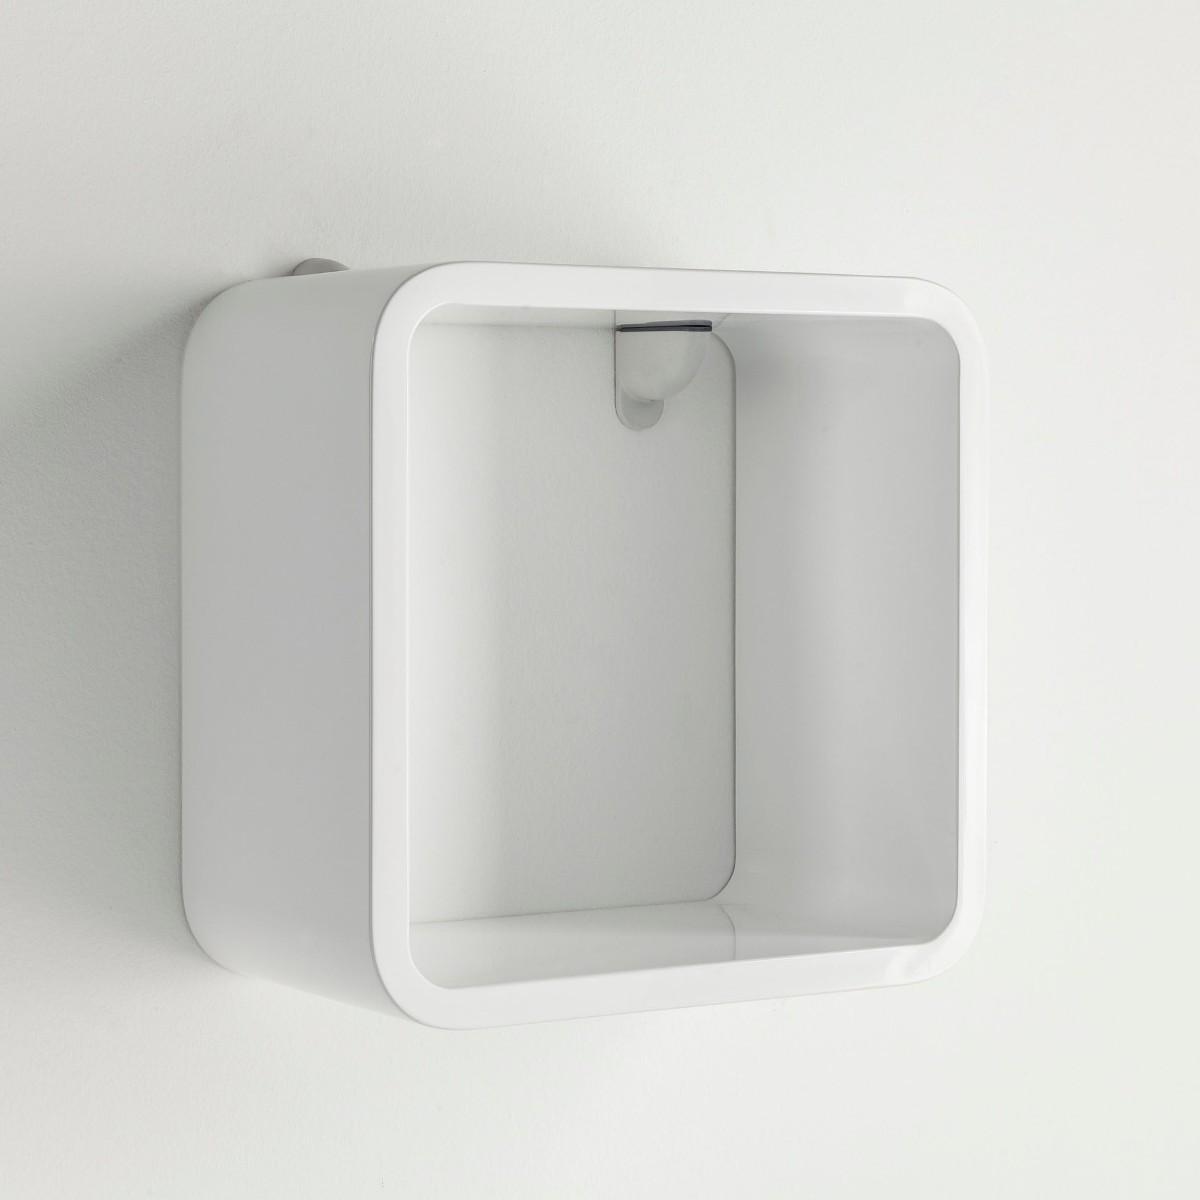 Kubetto set 3 cubi mensola da parete in legno bianco for Cubi da parete ikea